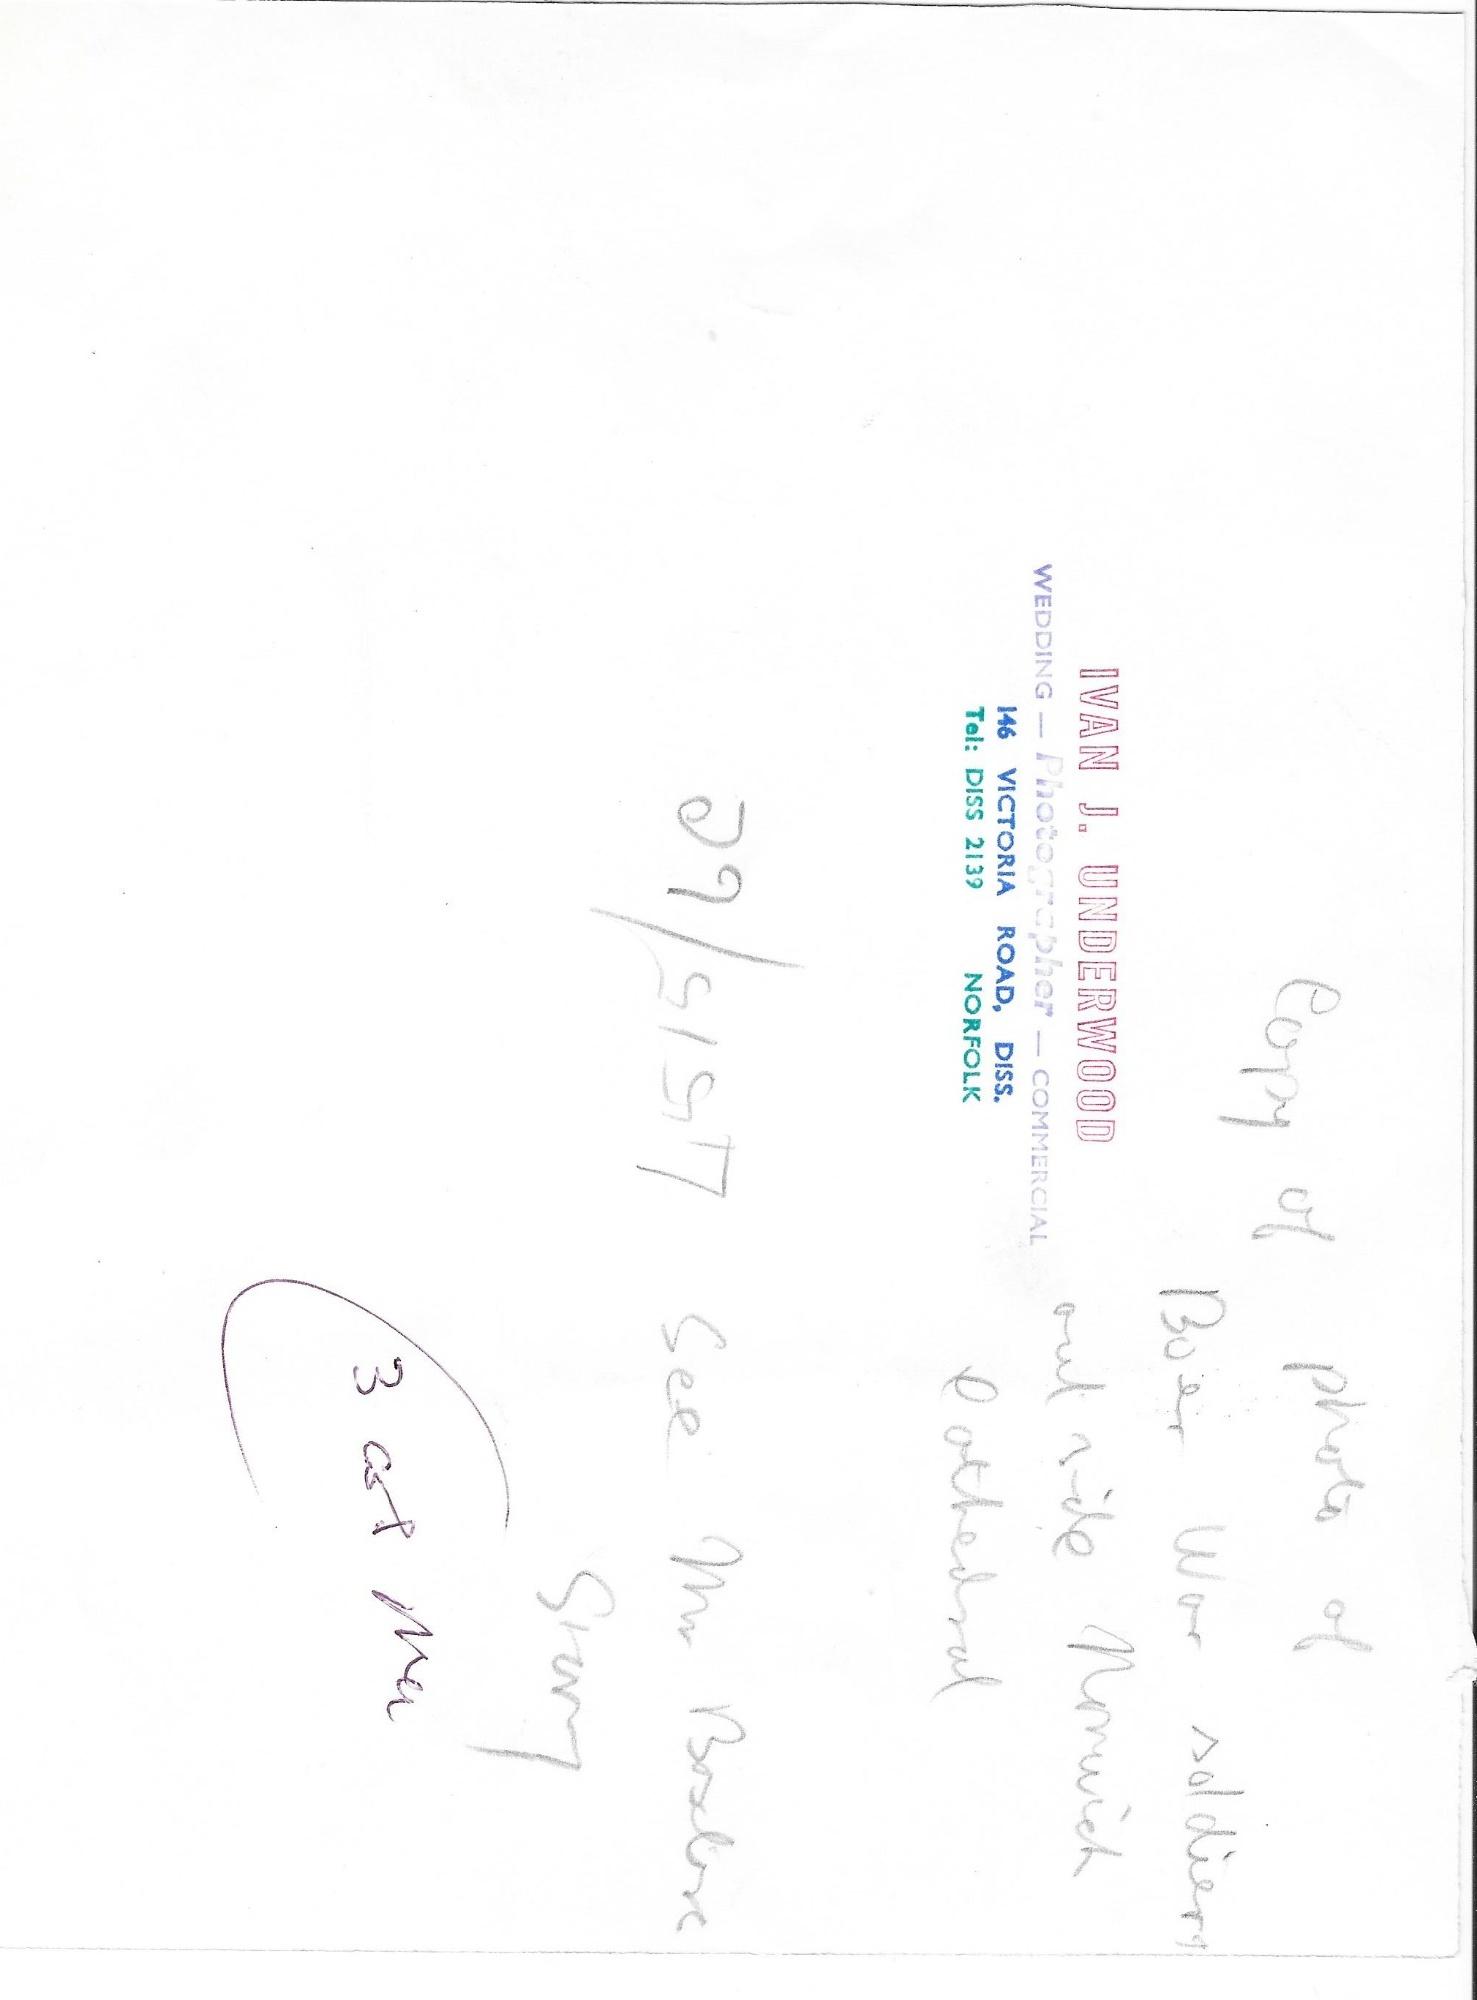 iynorwichcathdralrev_2021-02-11.jpg